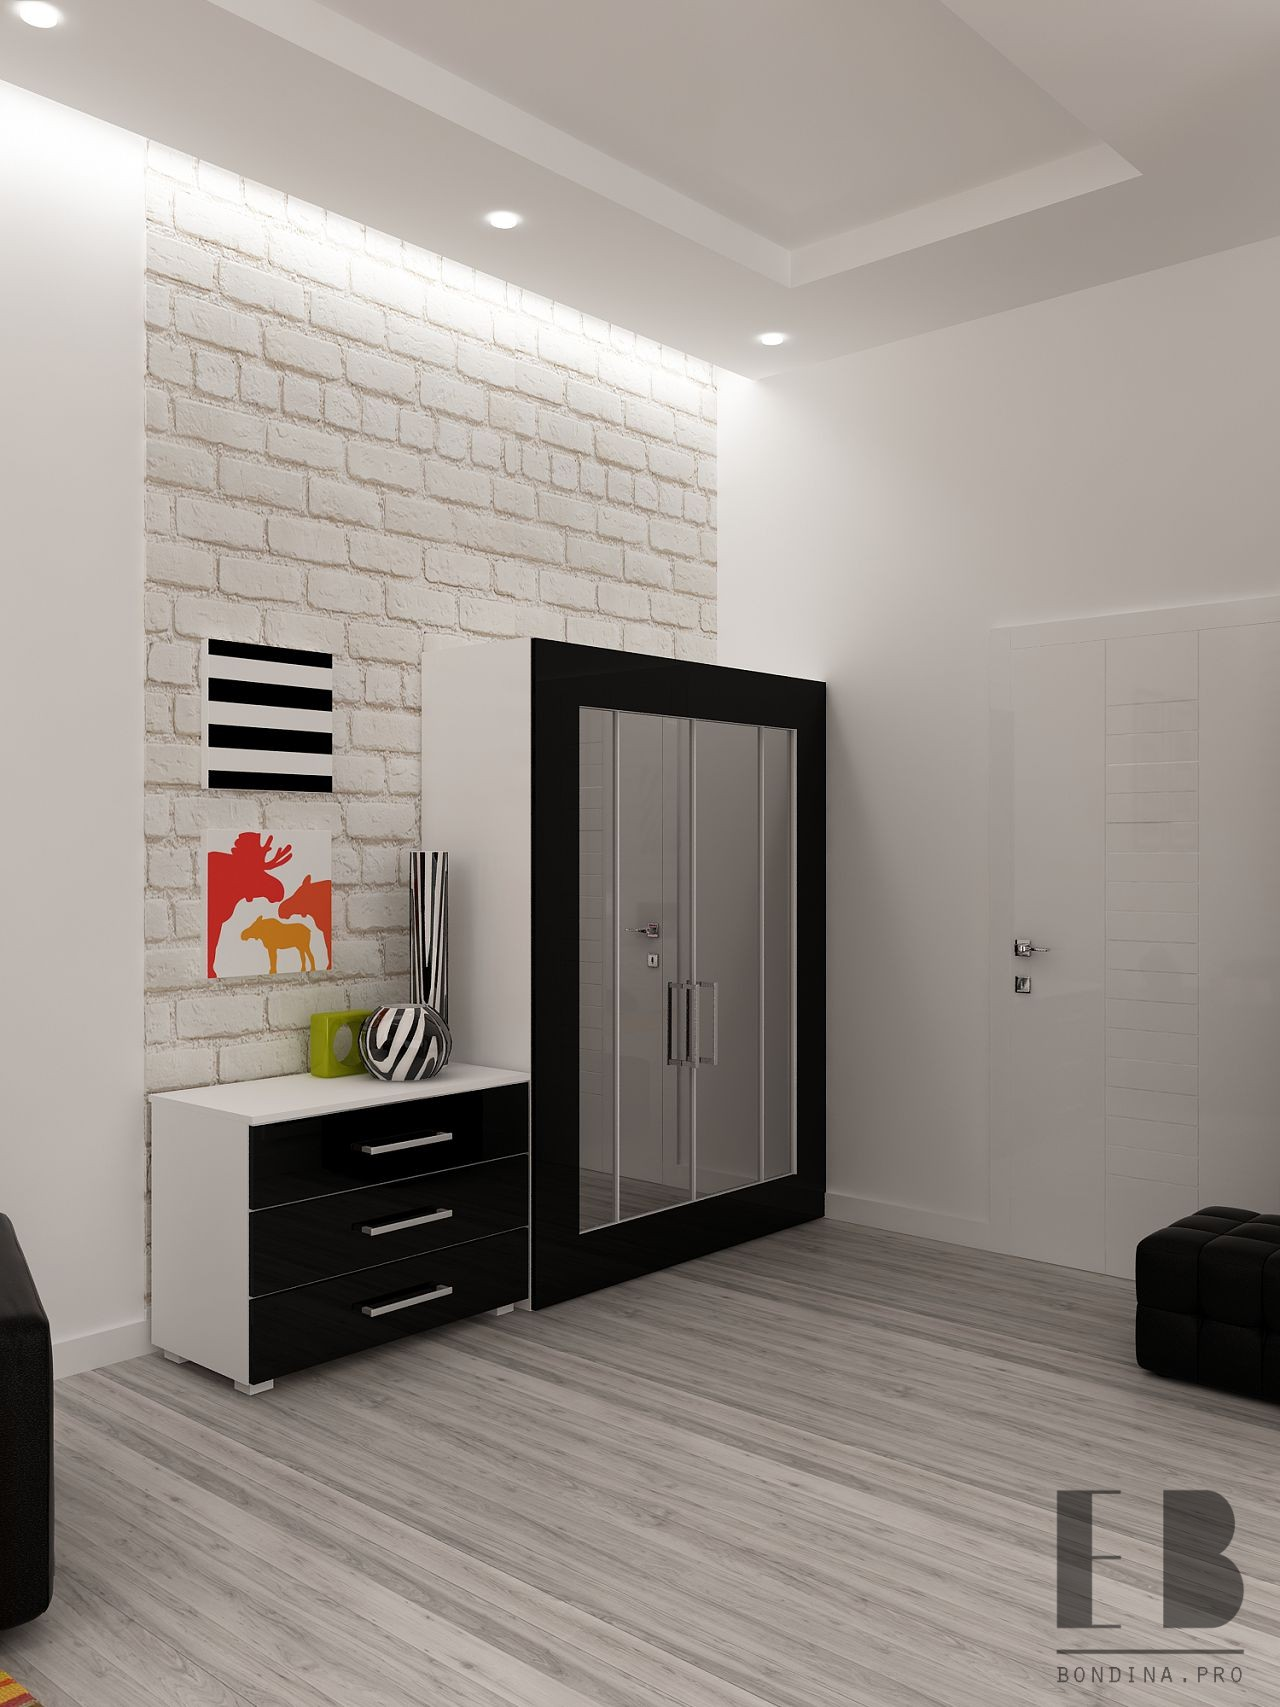 Design of a bedroom-living room